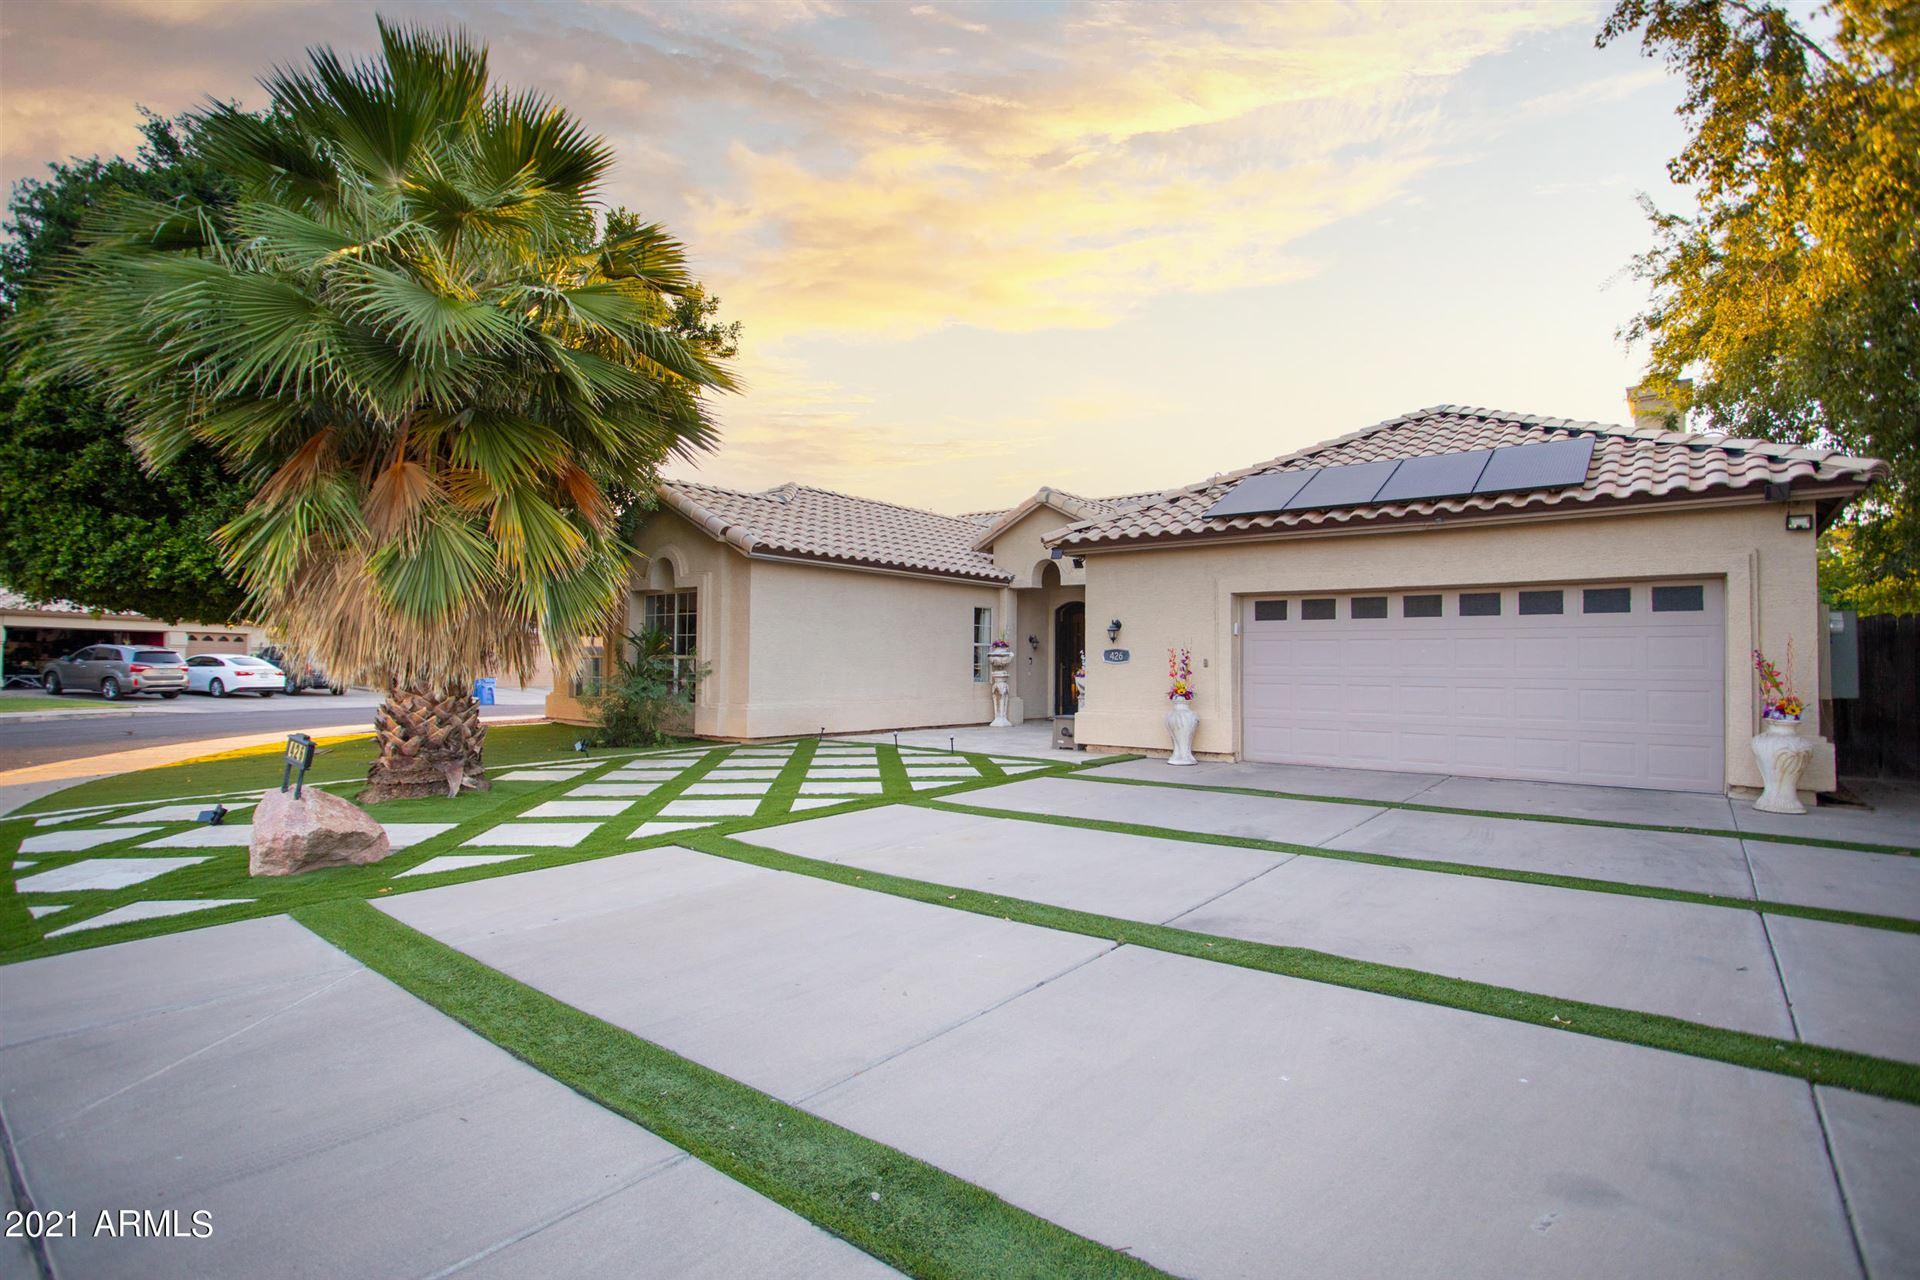 426 W SAGEBRUSH Street, Gilbert, AZ 85233 - MLS#: 6235254